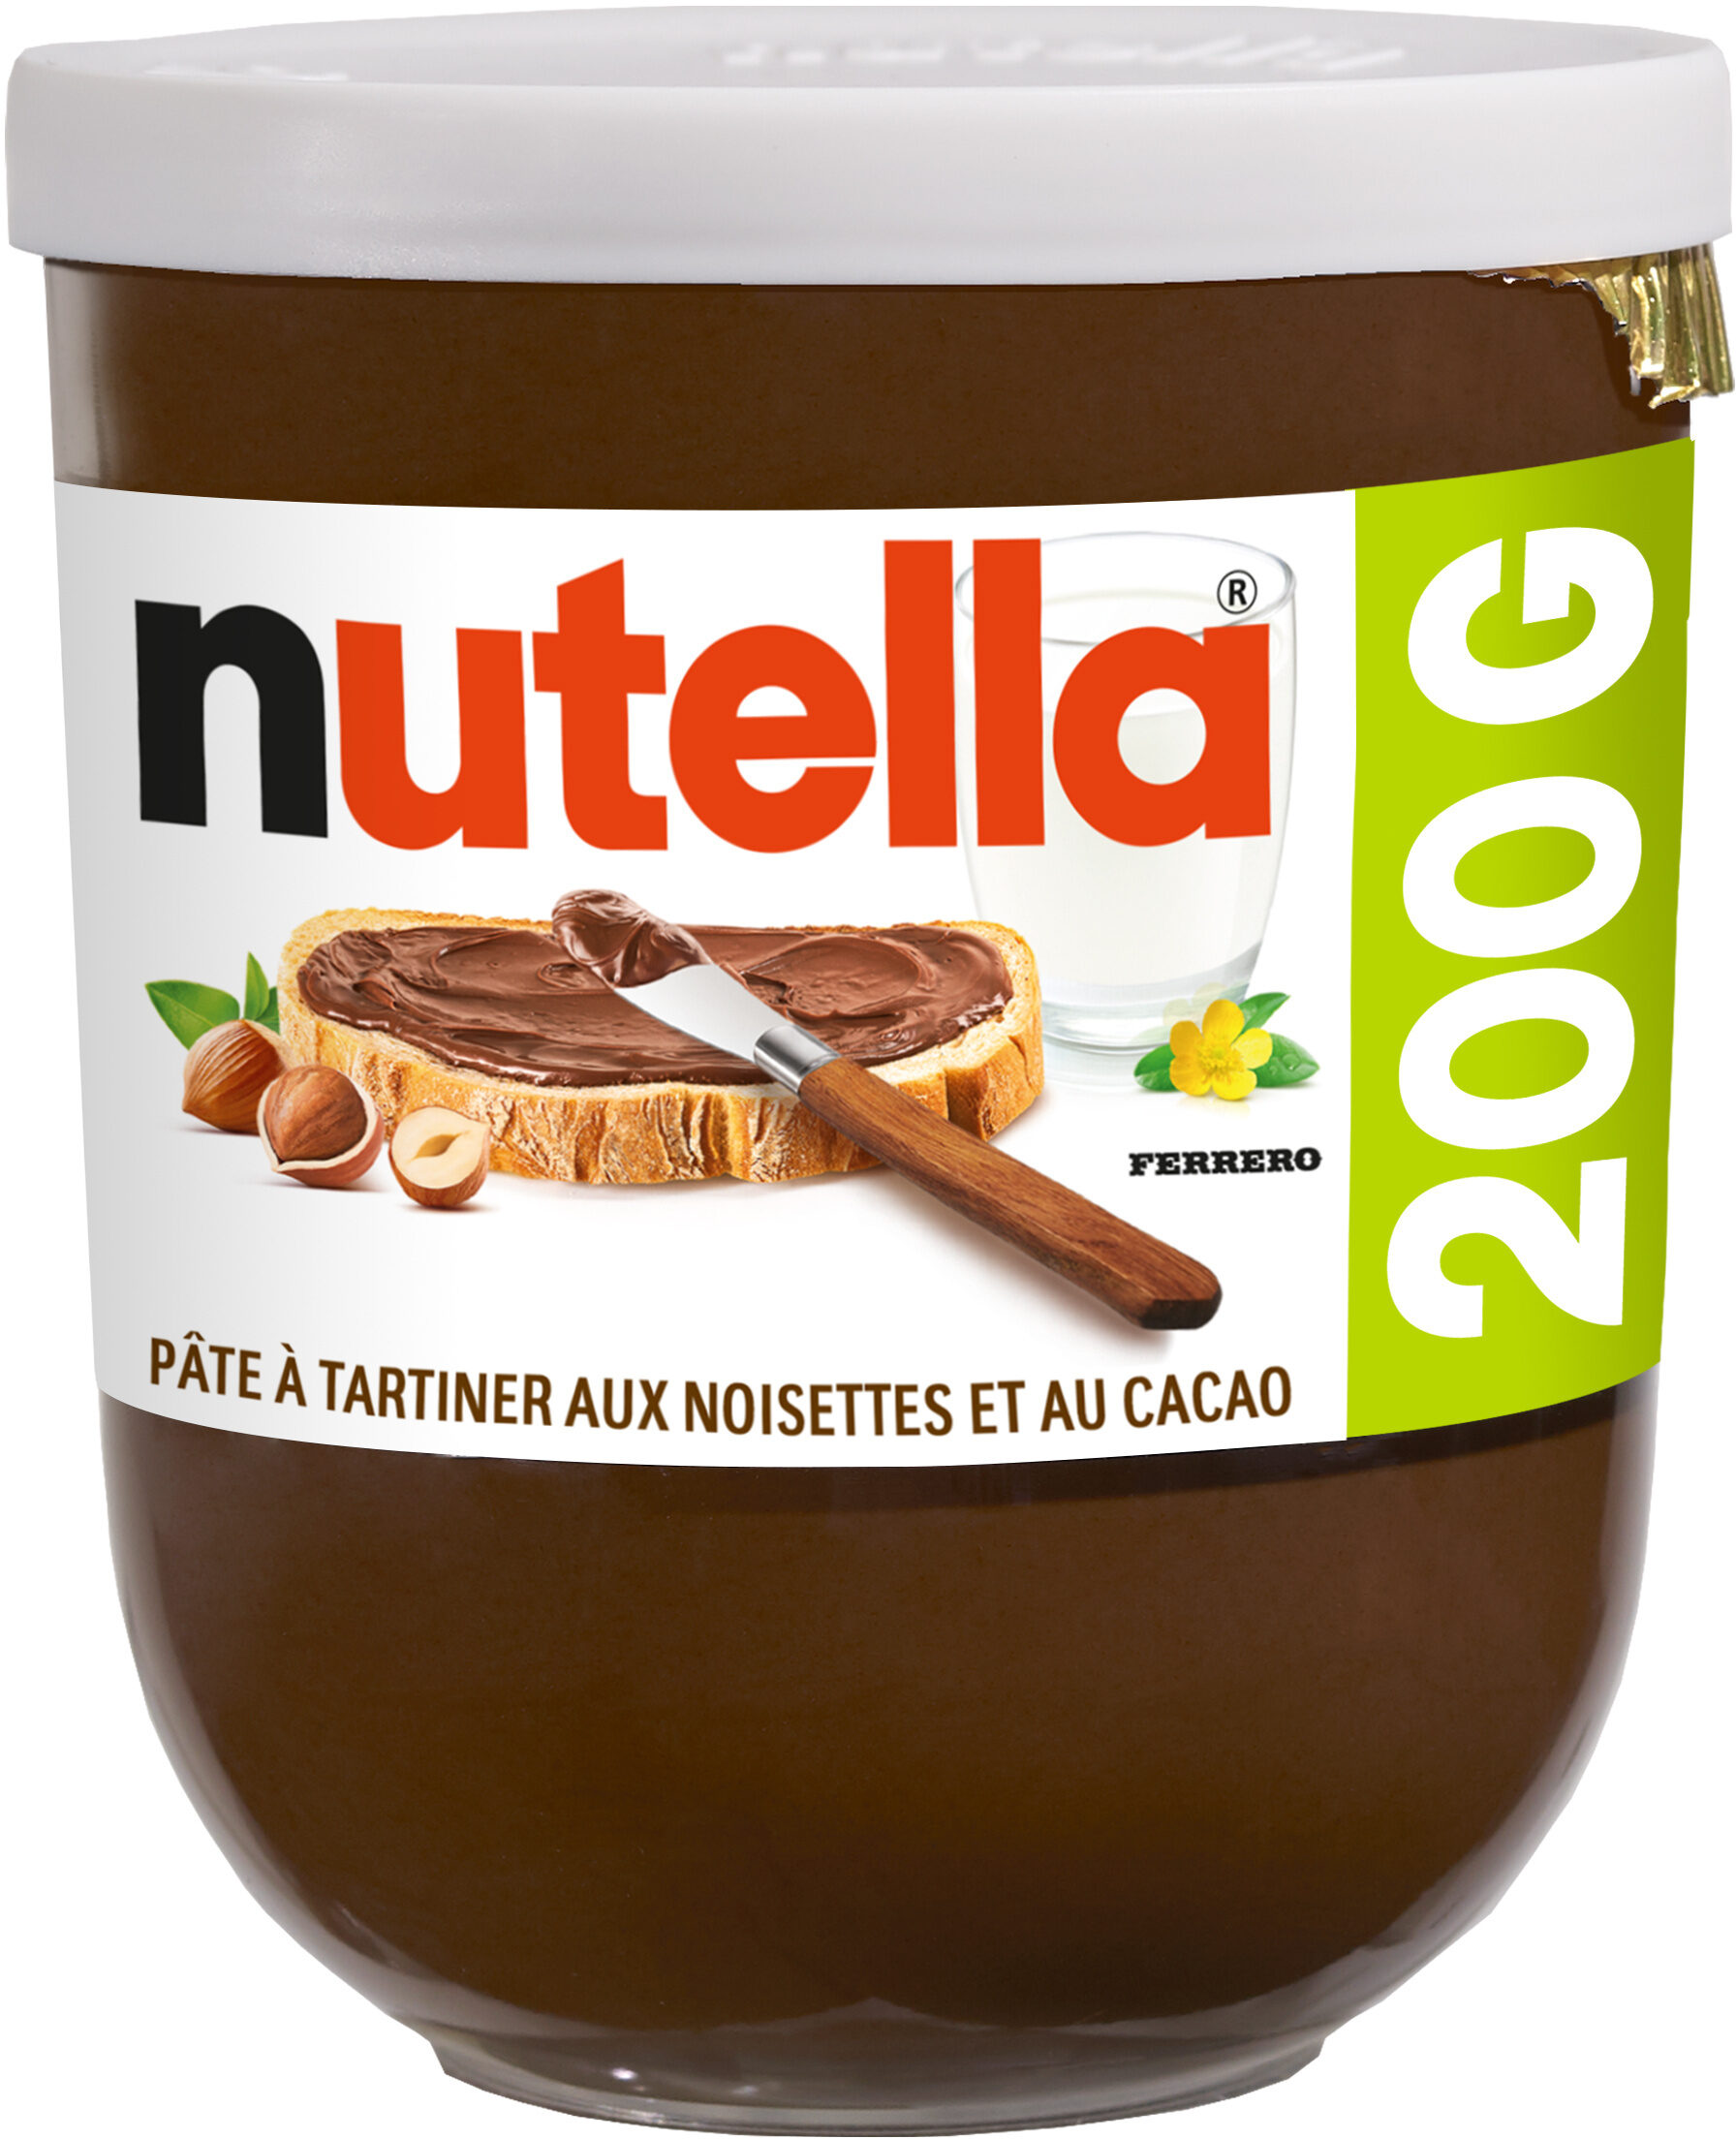 Nutella pate a tartiner noisettes-cacao t200 pot de - Producto - fr